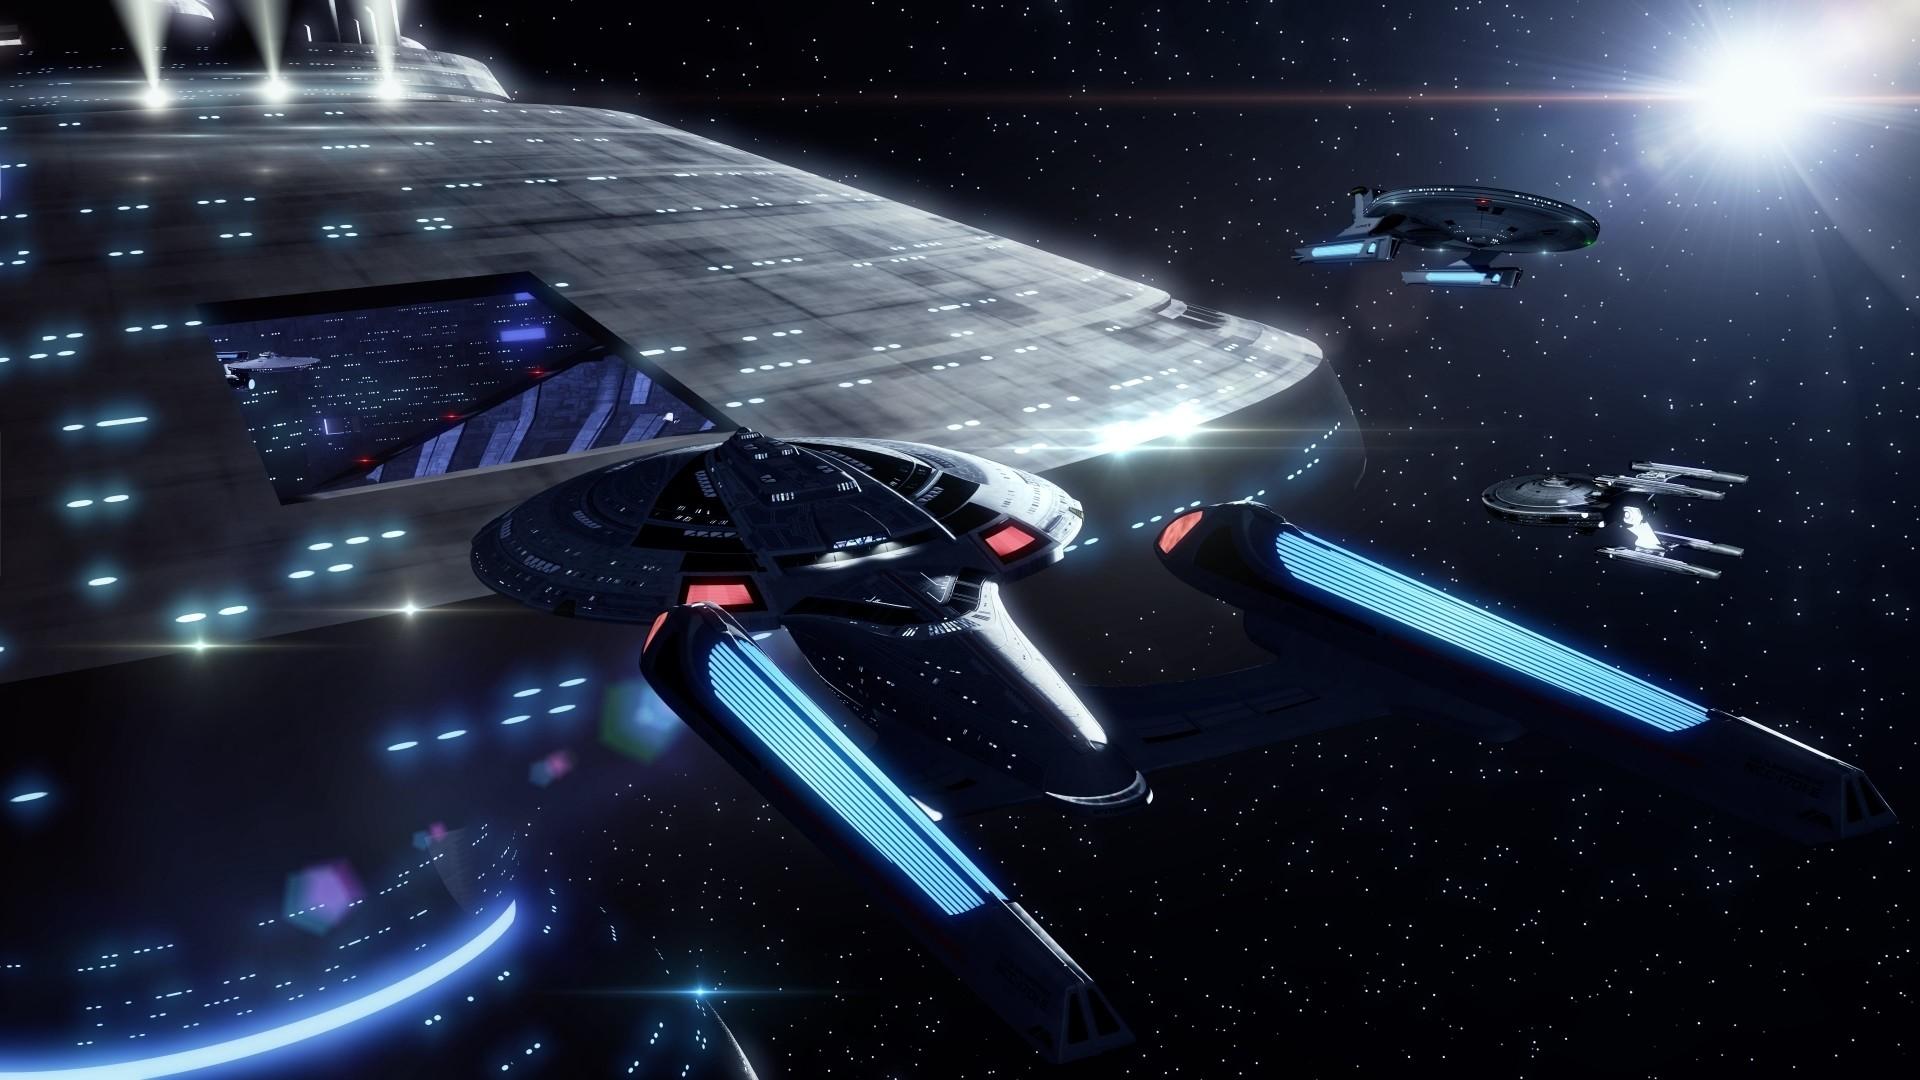 Star Trek computer wallpaper